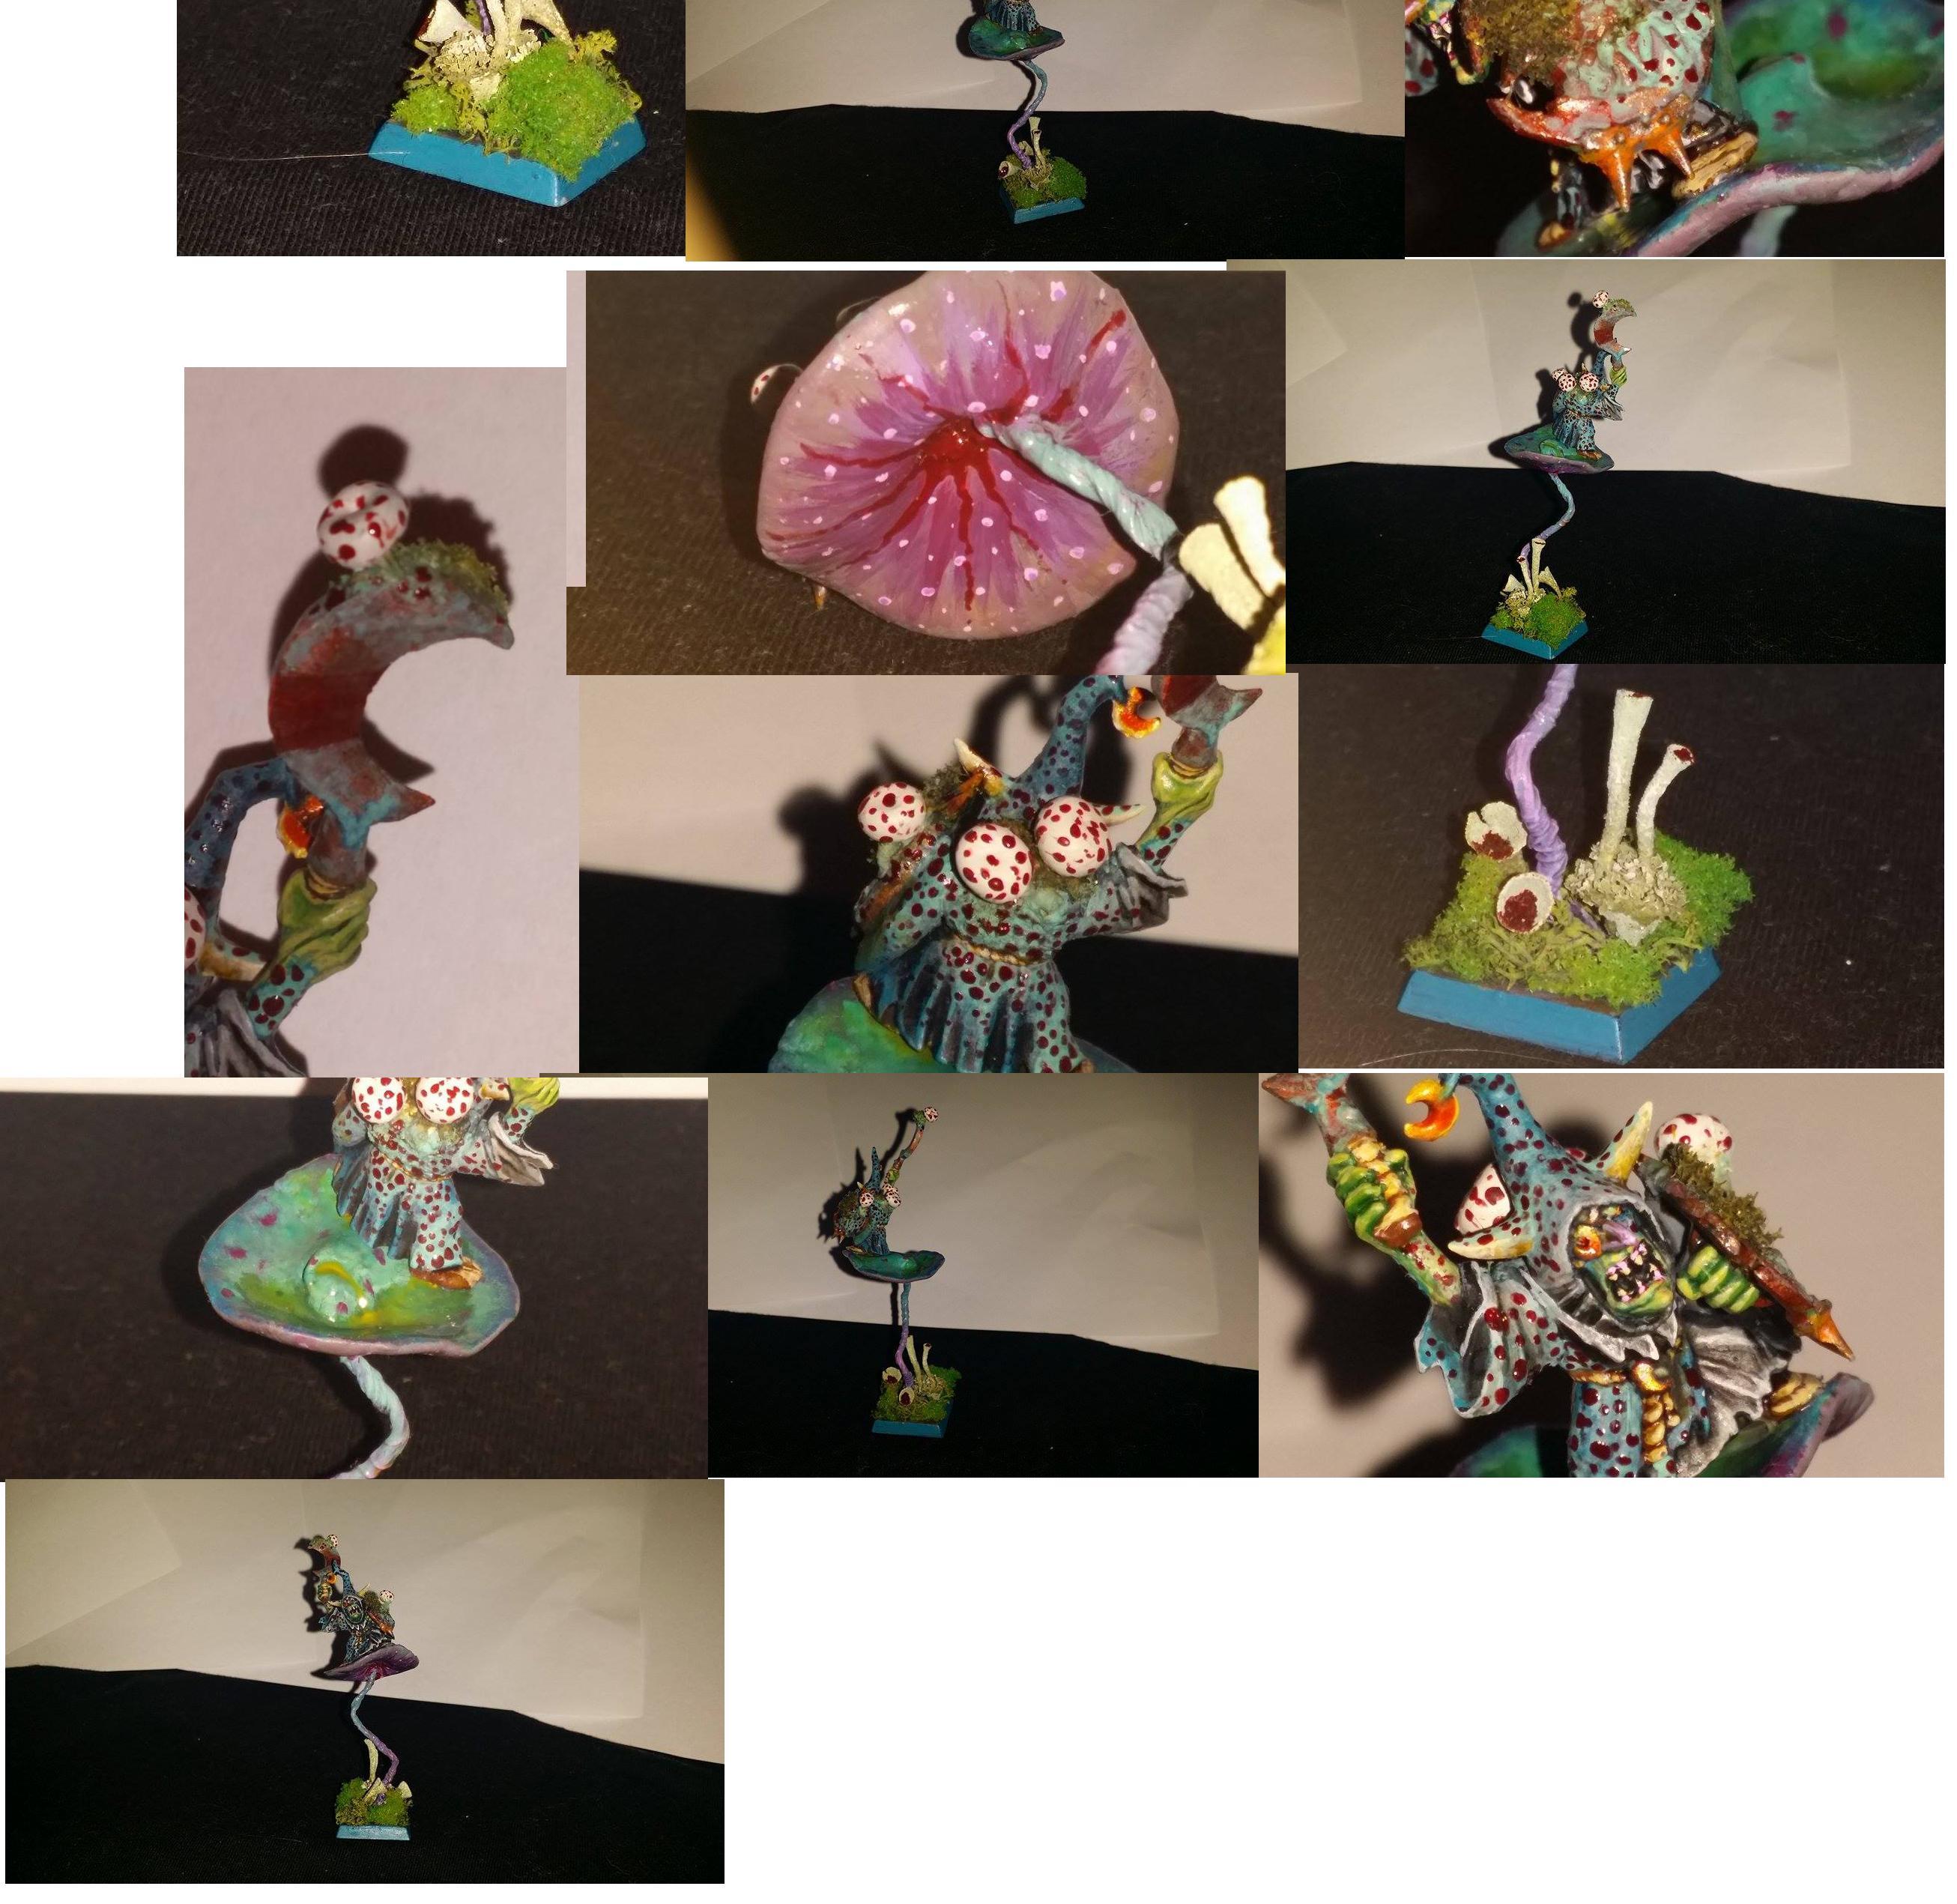 Champion, Fungus, Goblins, Greenstuff, Moss, Mushroom, Night, Plants, Sculpted, Sculpting, Slime, Slimey, Slimy, Wildlife